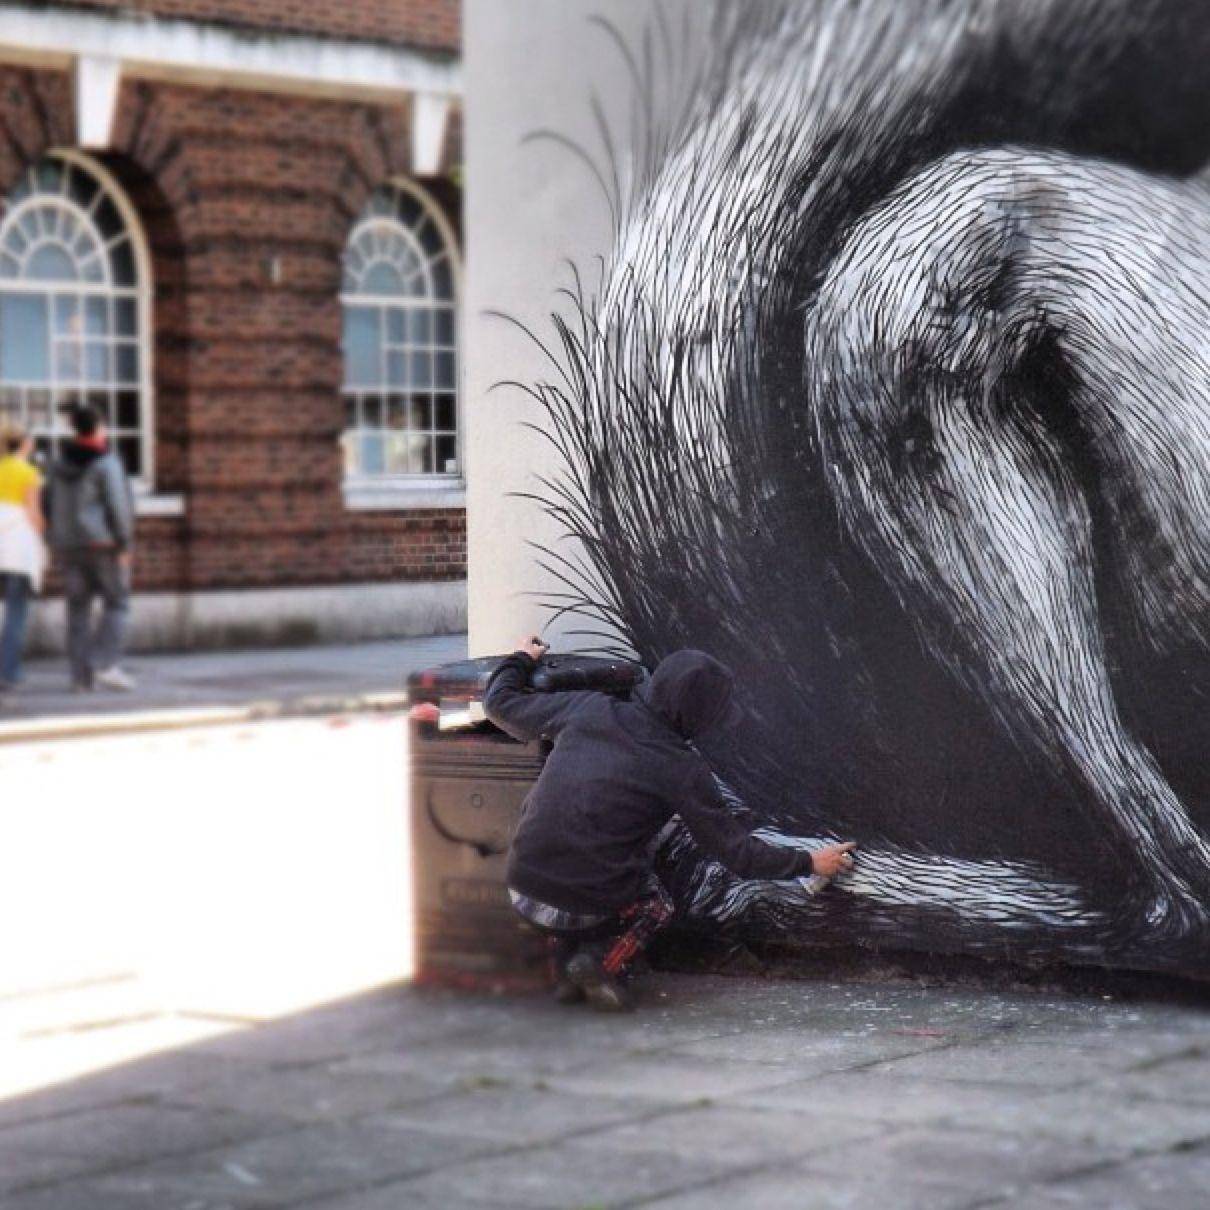 AM_ROA_streetart_maniiakz_bristol - 1